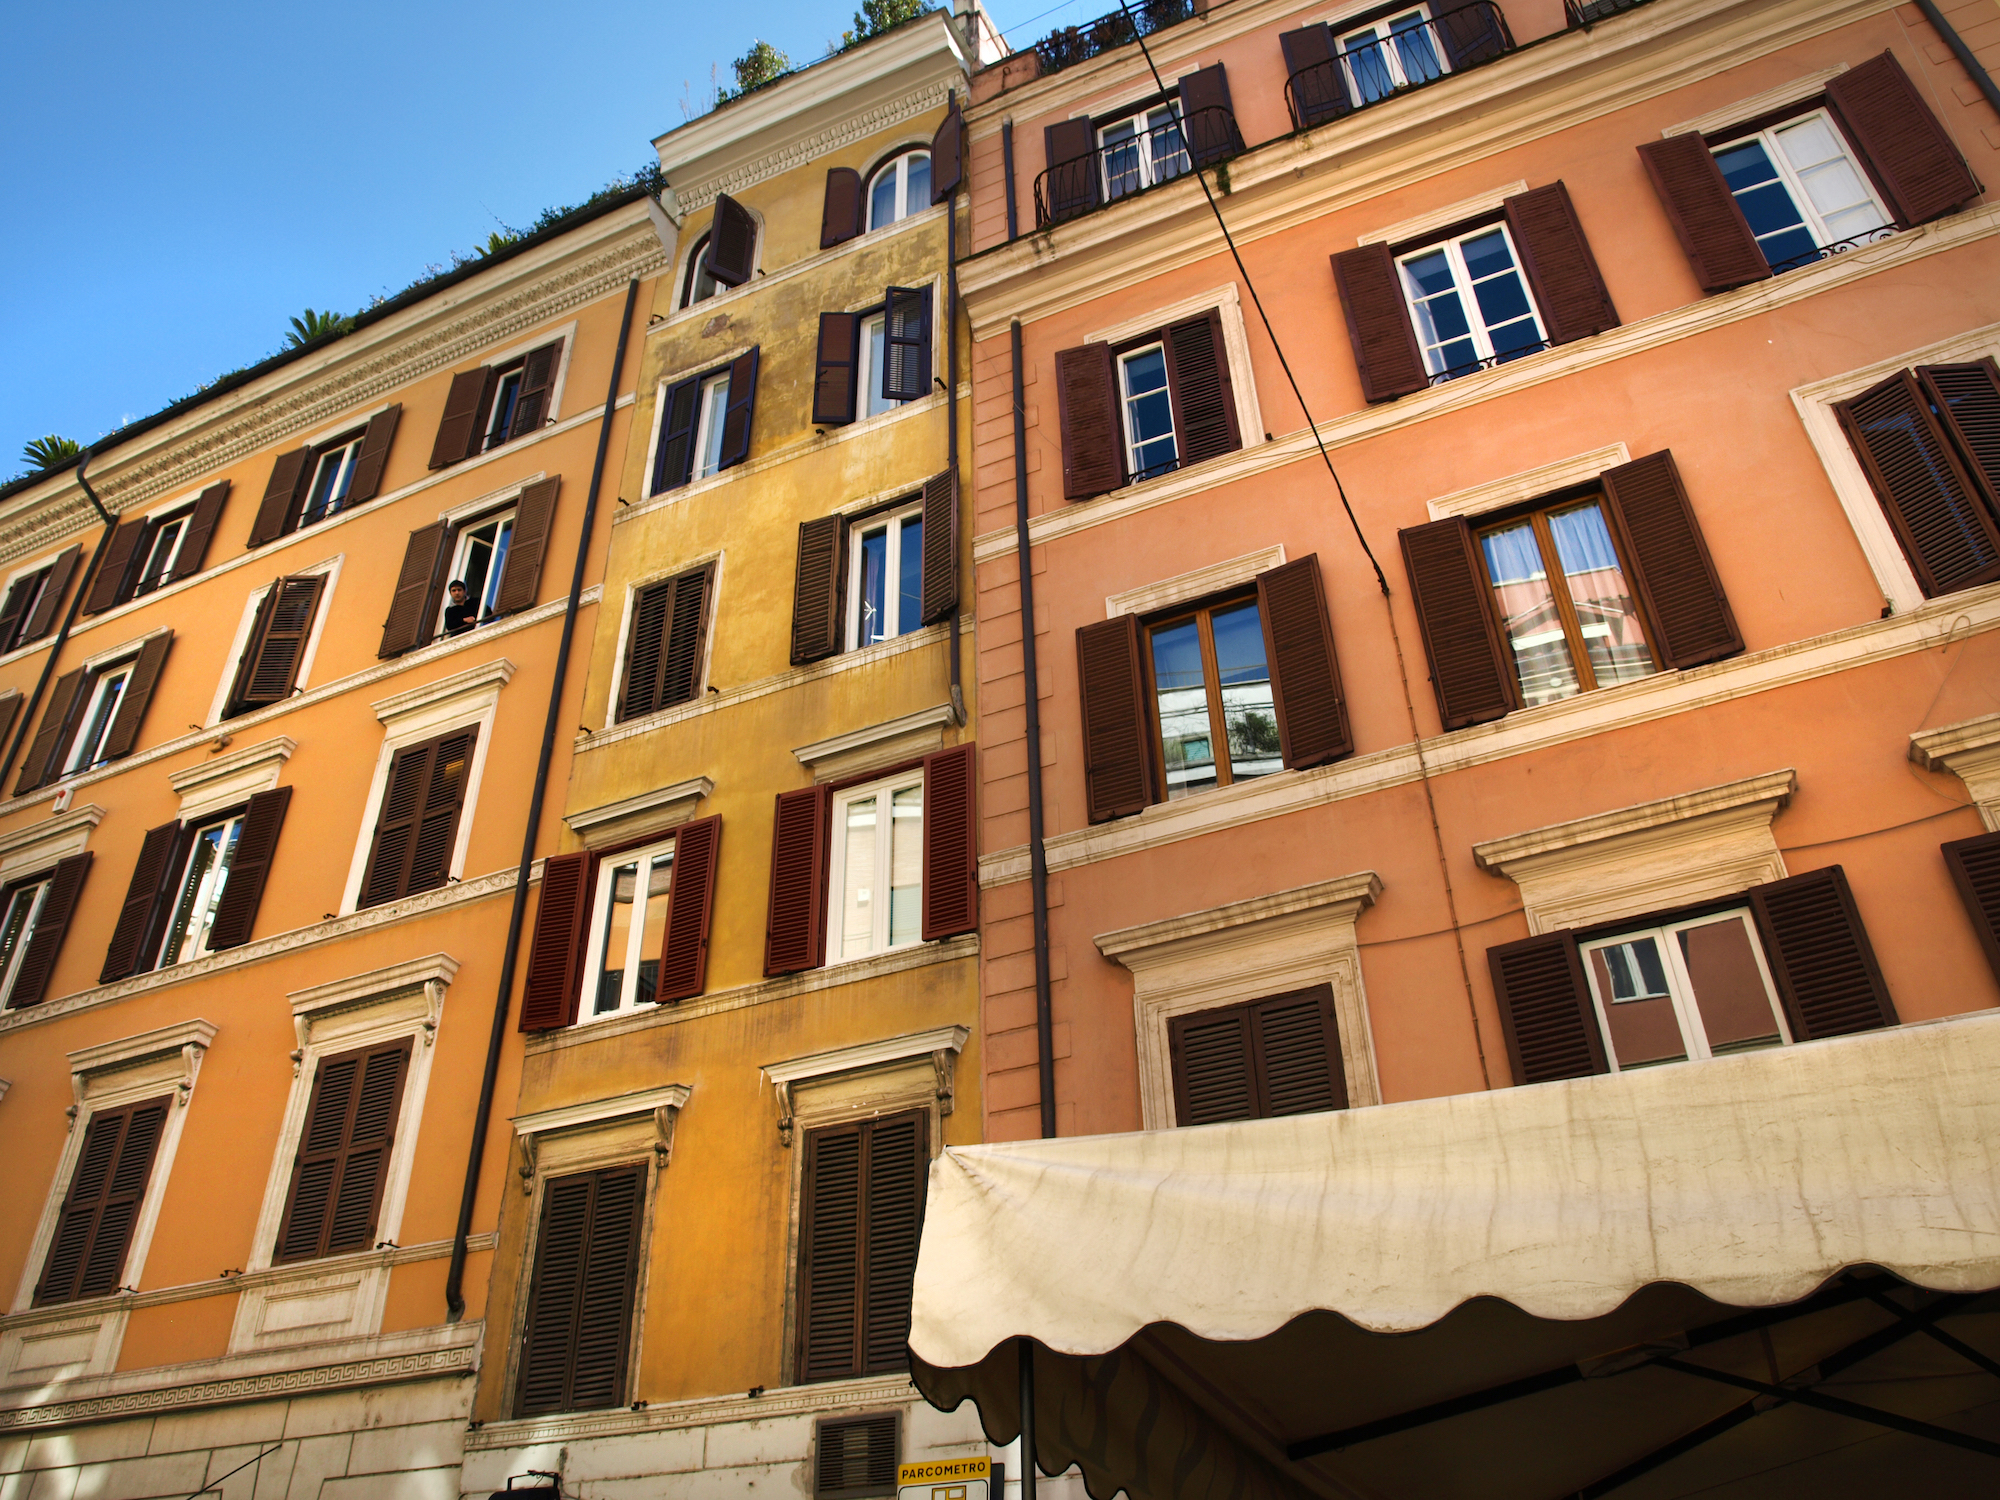 Via delle Carrozze, Italy  / Geena Matuson @geenamatuson #thegirlmirage